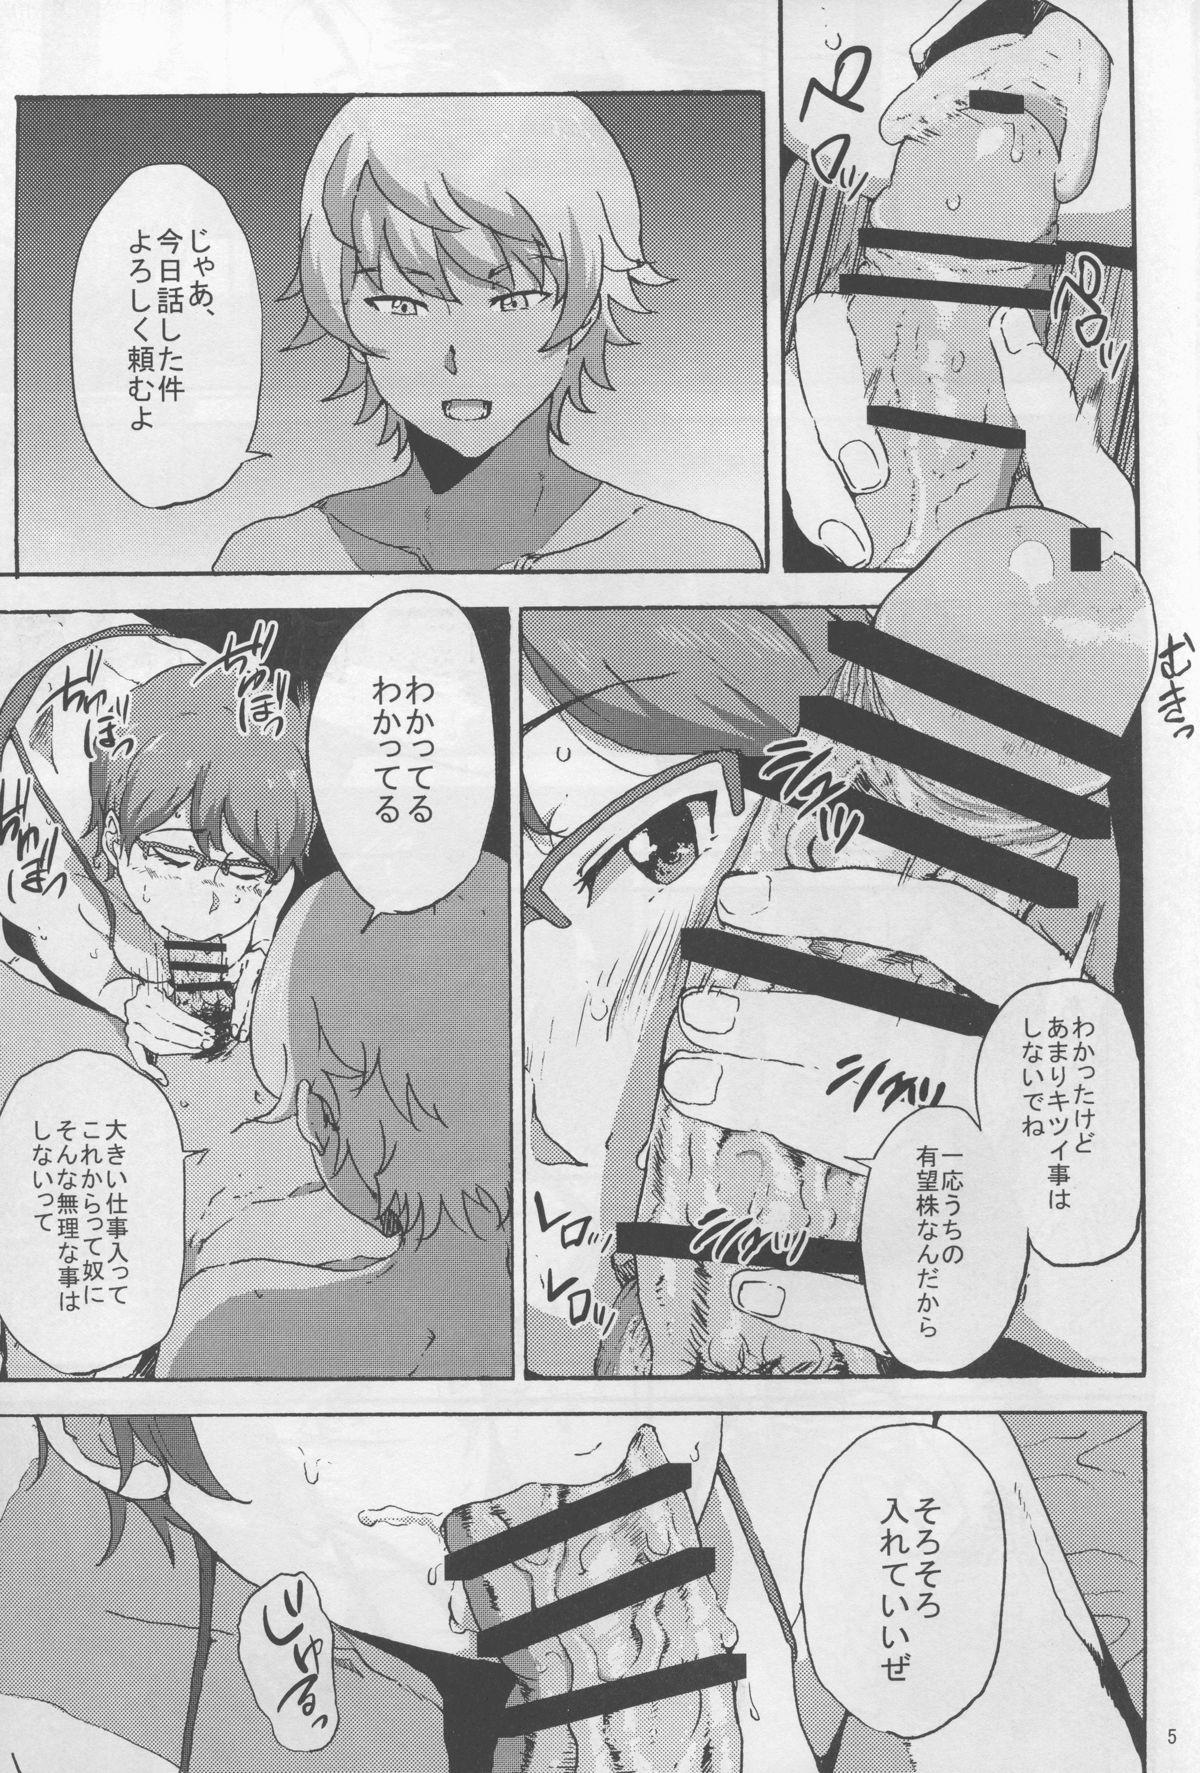 Mirai-chan ga Sandaime SGOCK no Leader ni Damasare Yarechau Hon 4